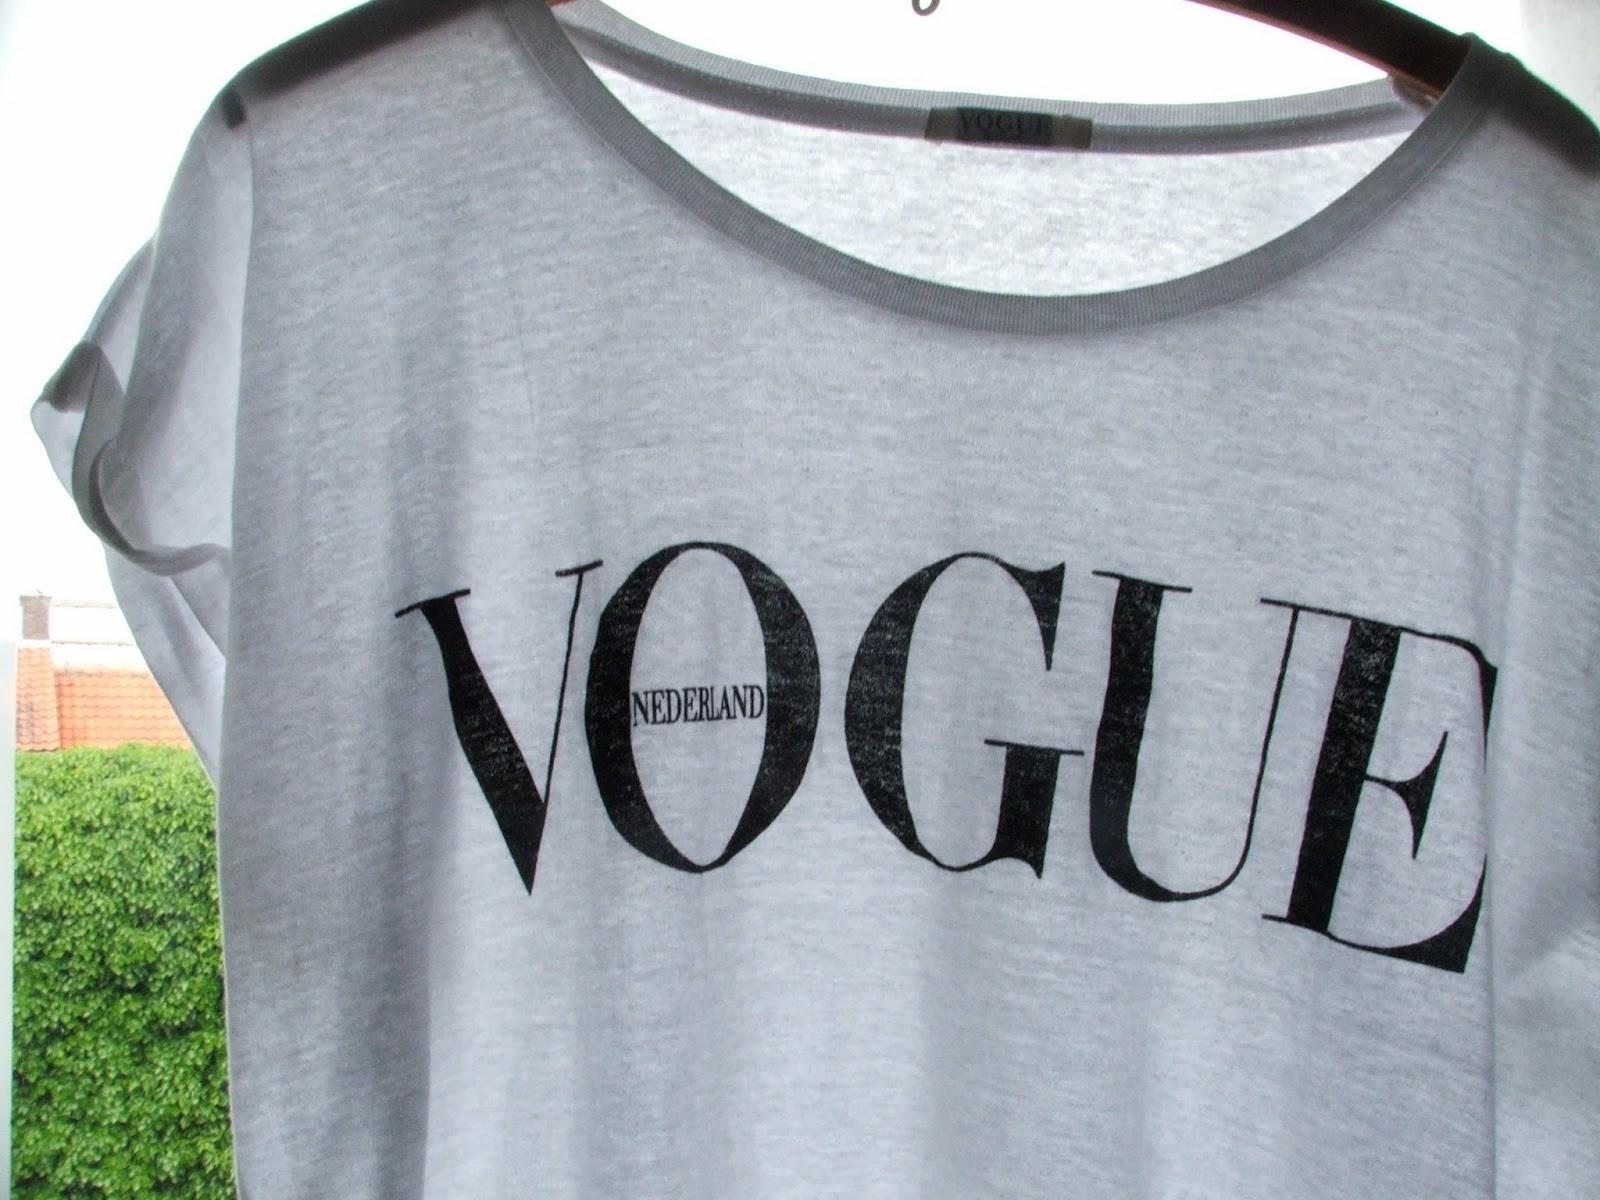 Vogue Trui Kopen.Spread Your Wings New In Vogue Shirt